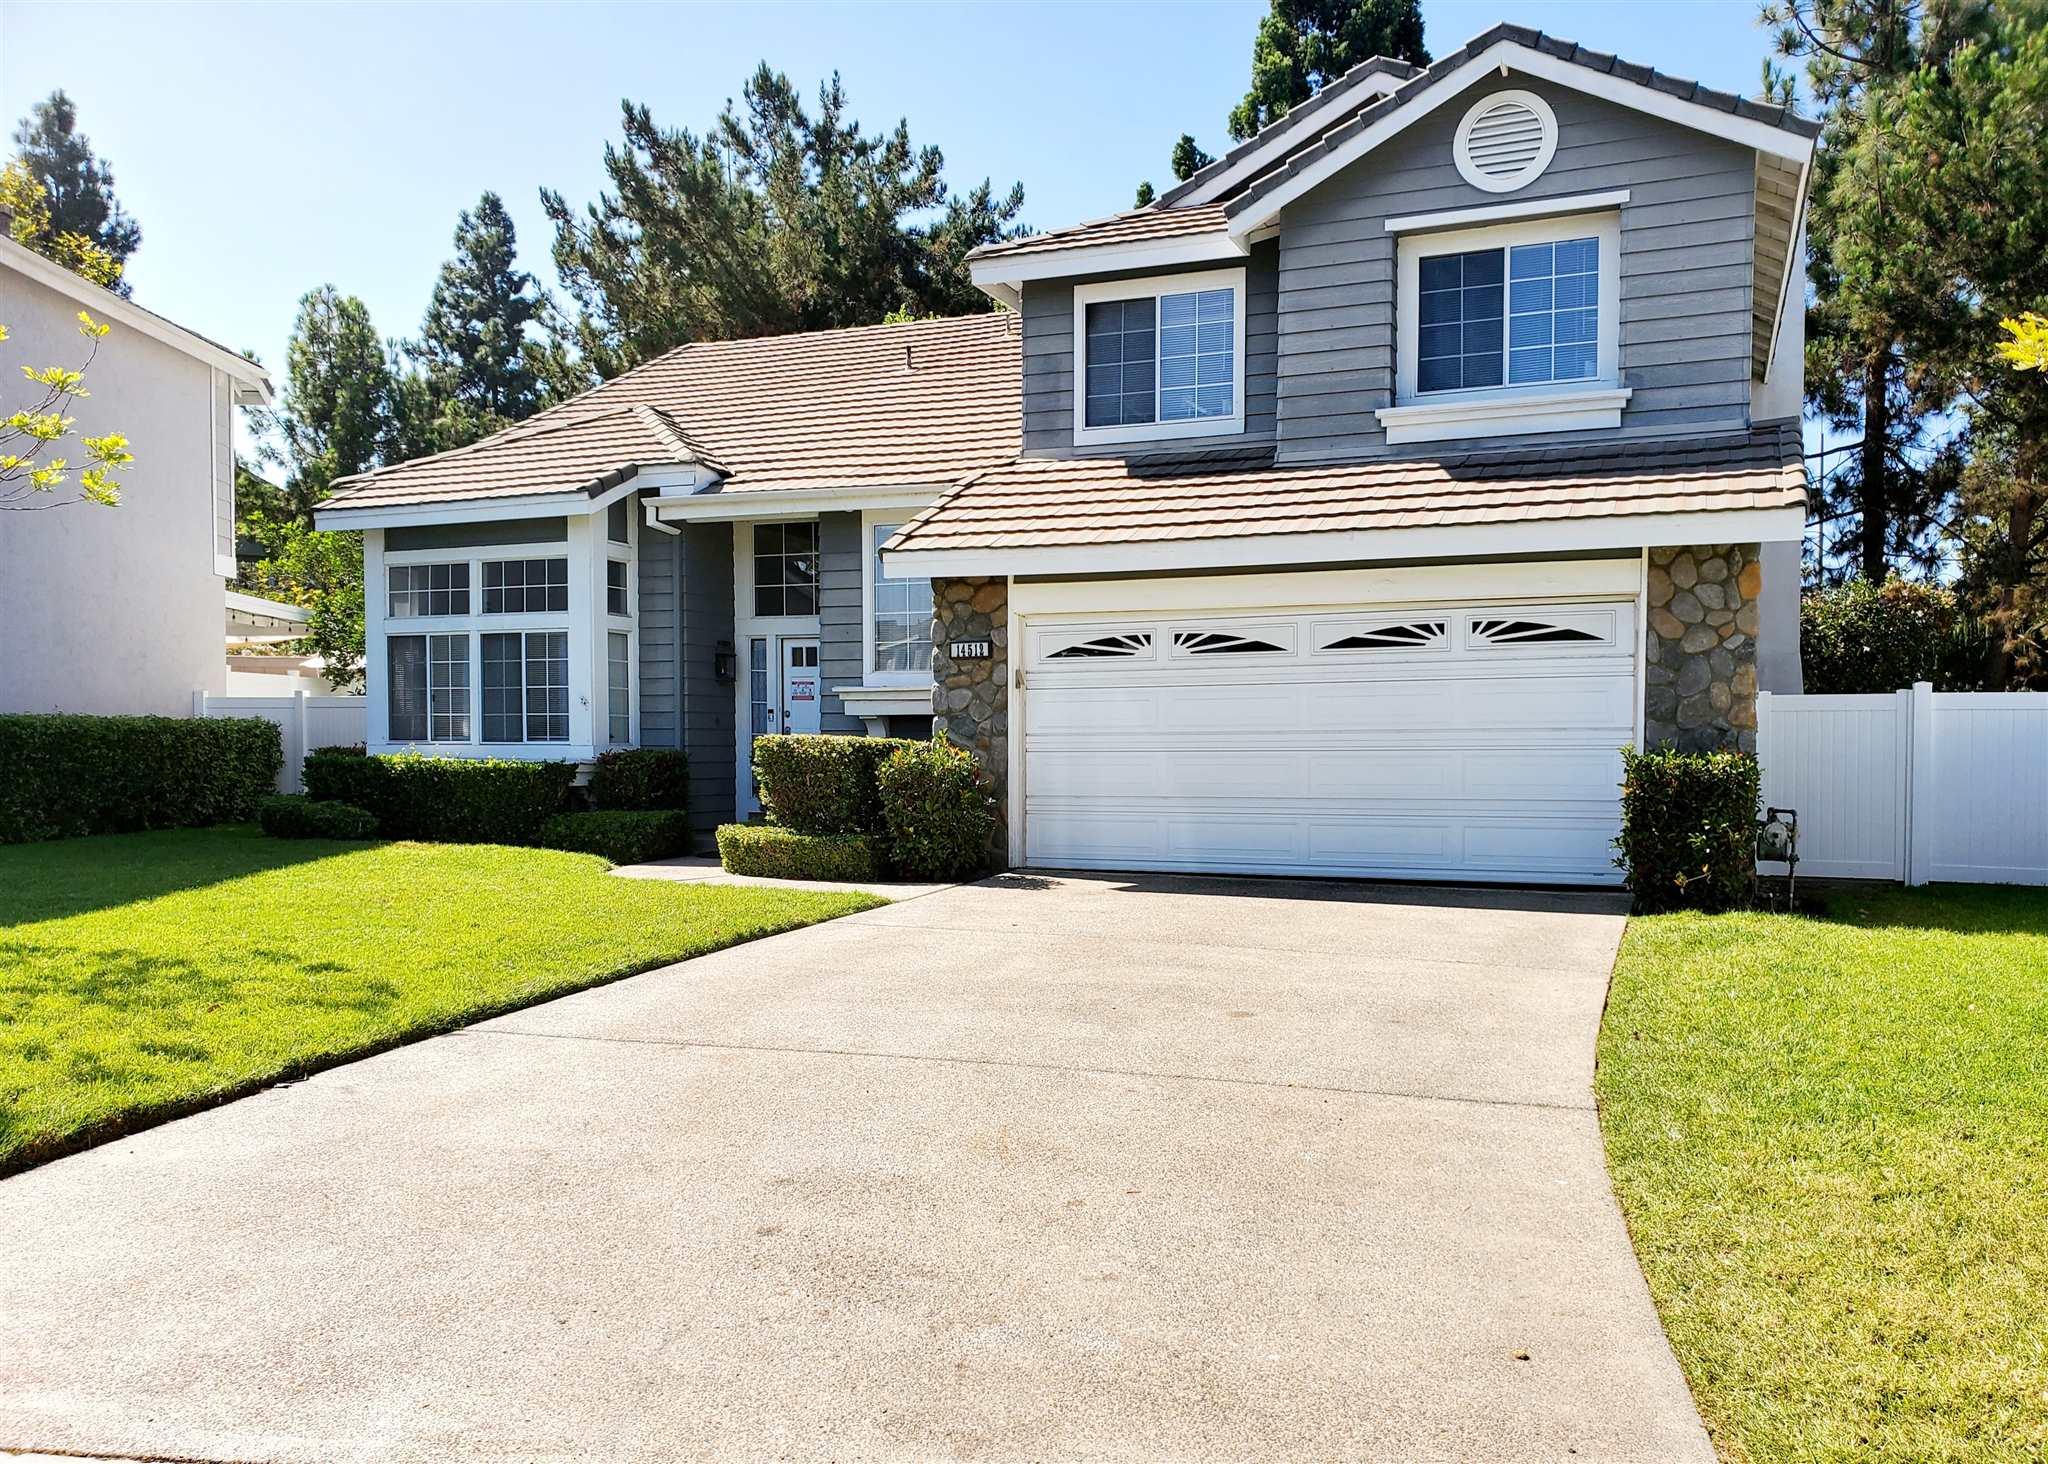 14512 Rutledge Square, San Diego CA 92128